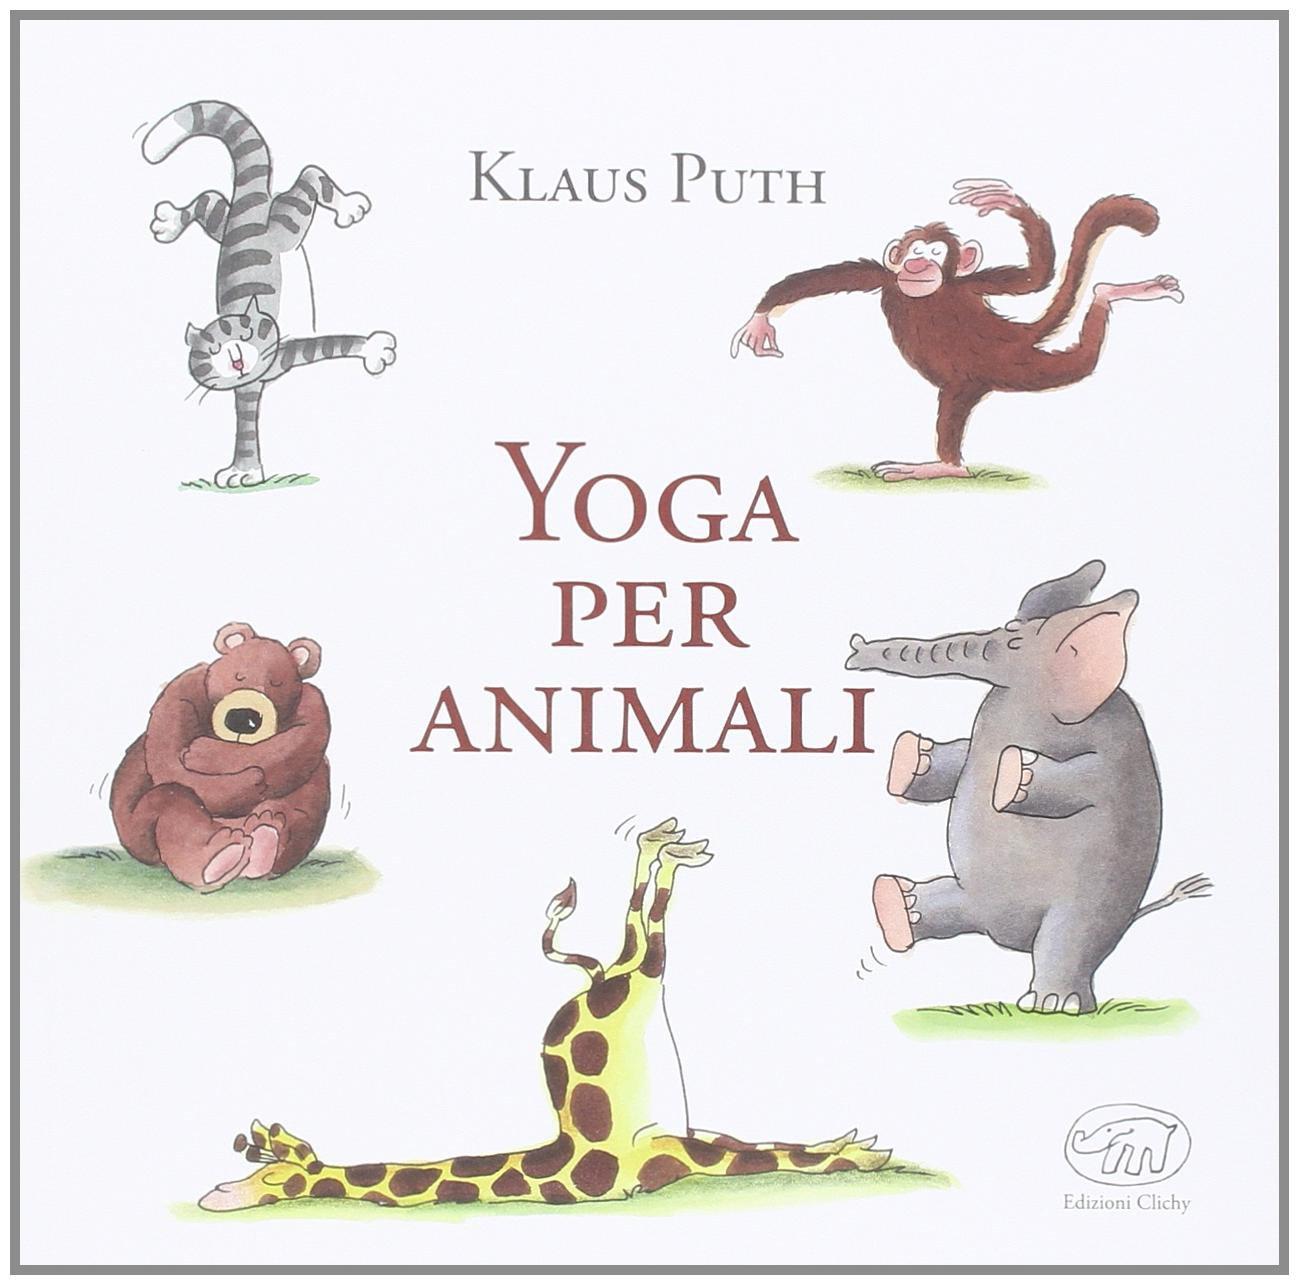 Yoga per animali (Beaubourg): Amazon.es: Klaus Puth: Libros ...